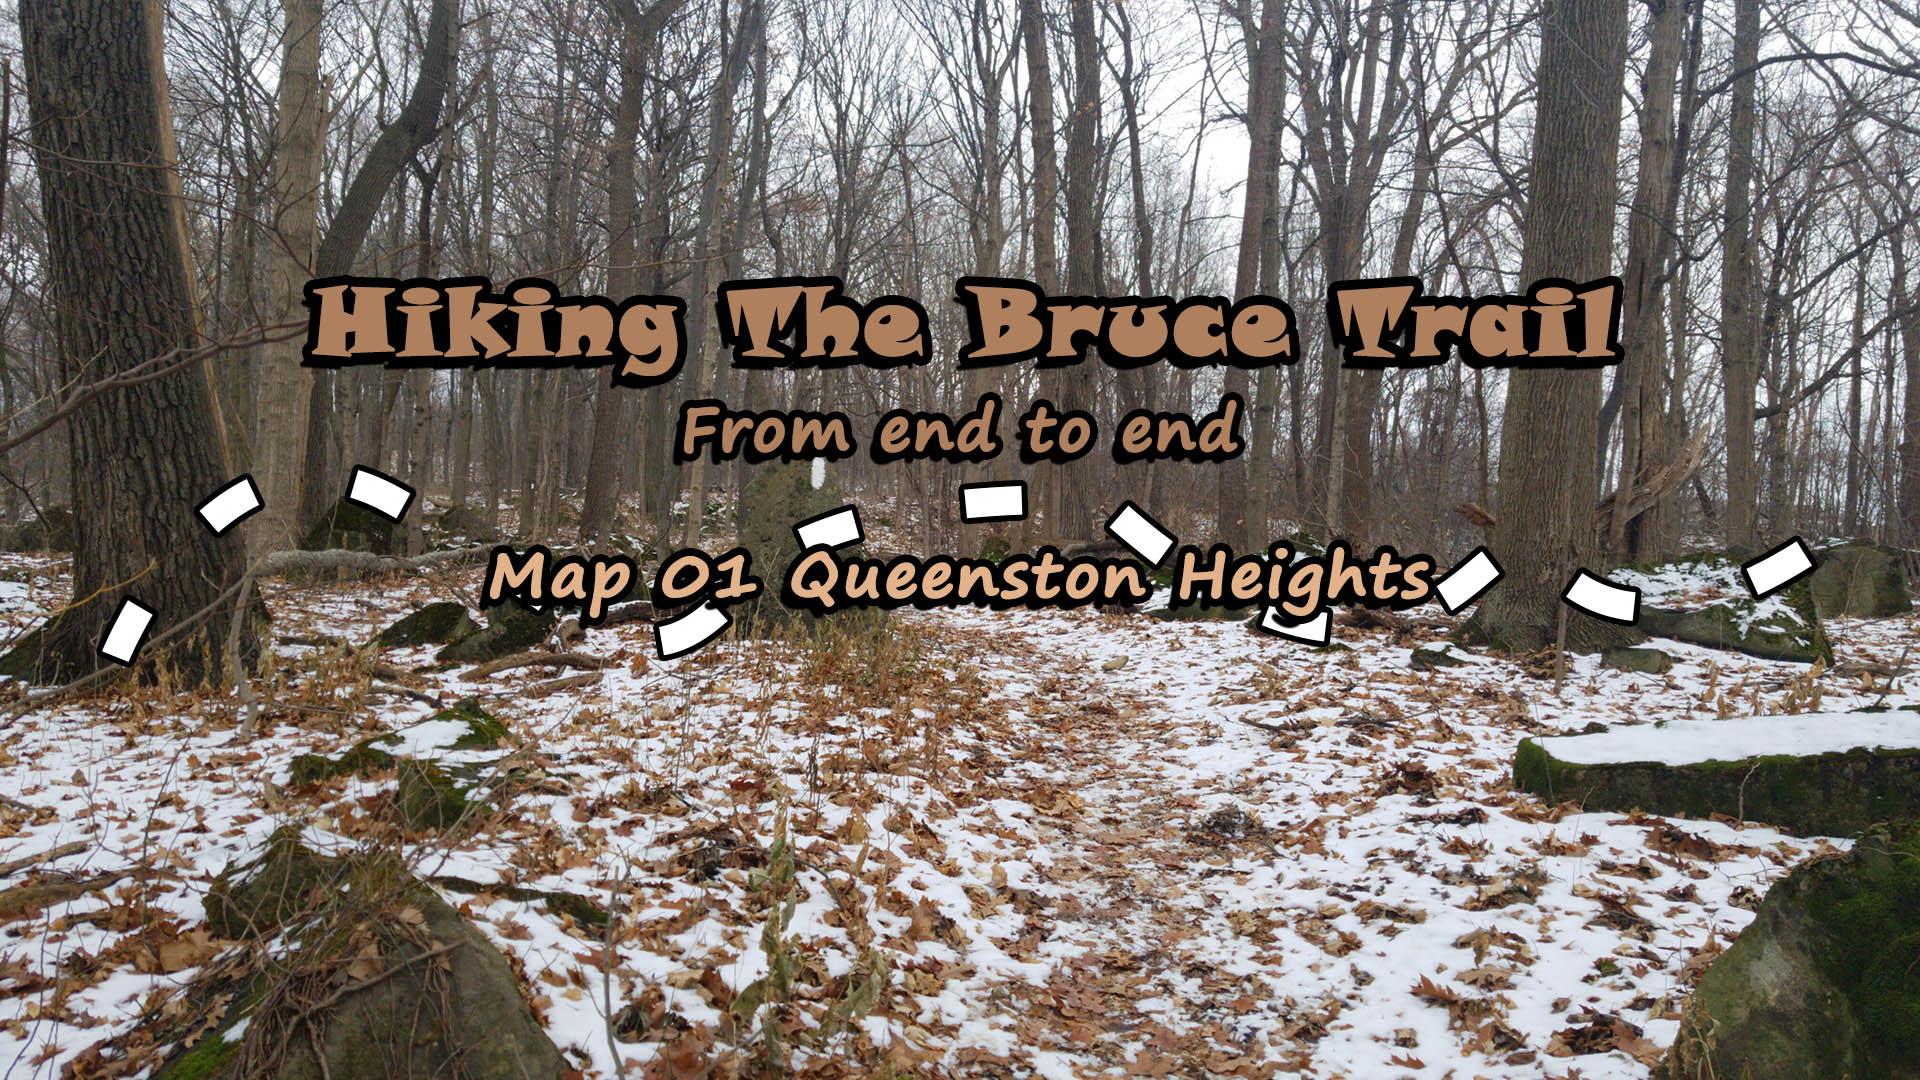 Bruce Trail 01 Queenston Heights